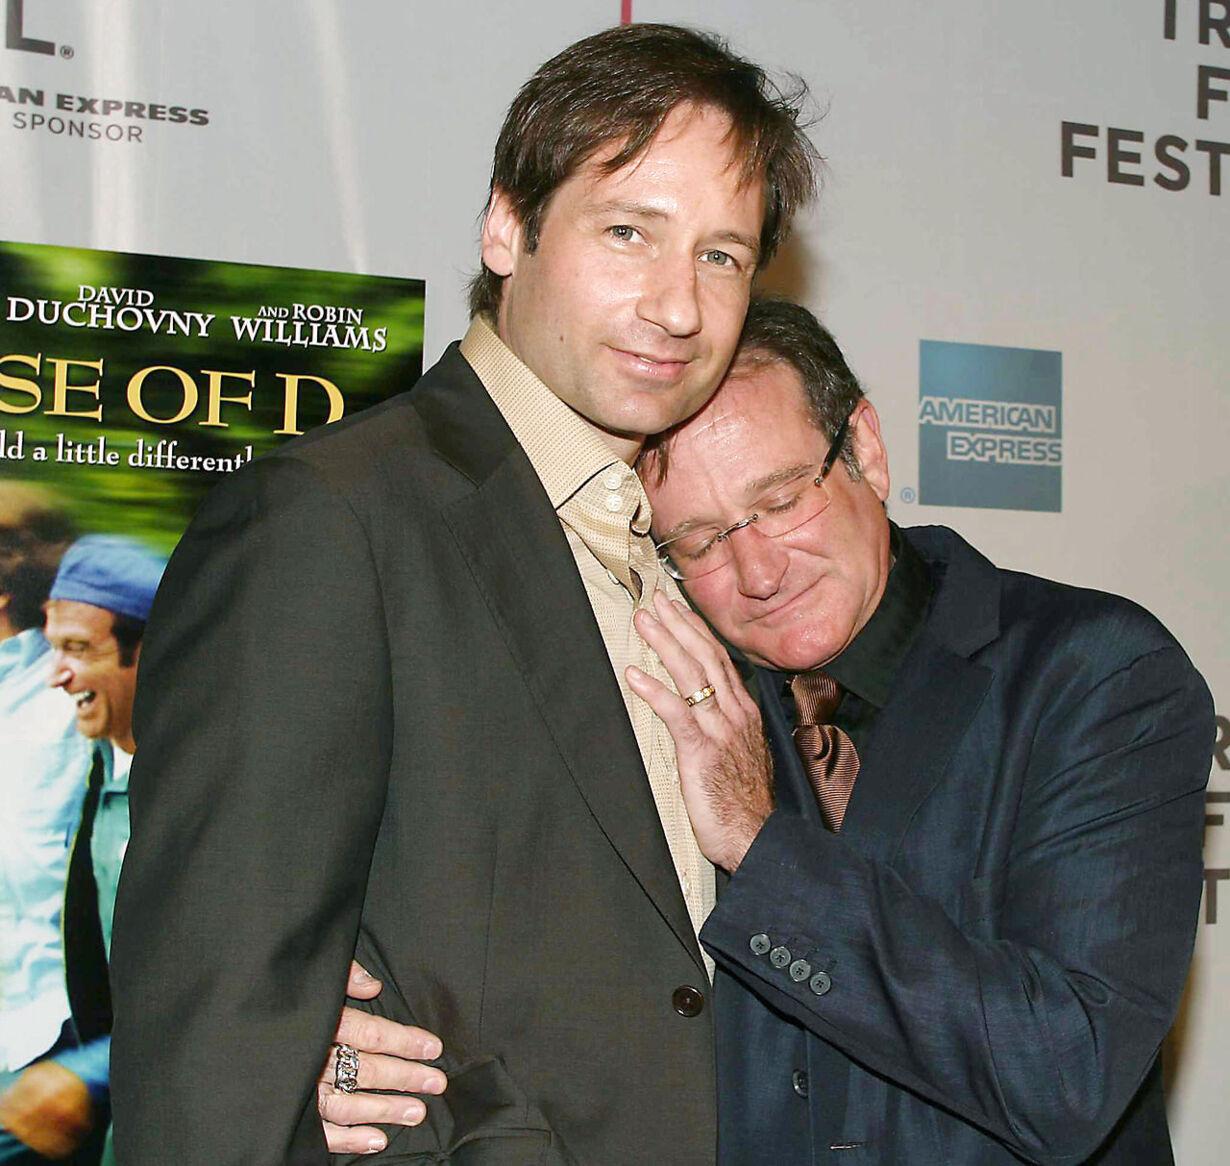 Williams og Duchovny